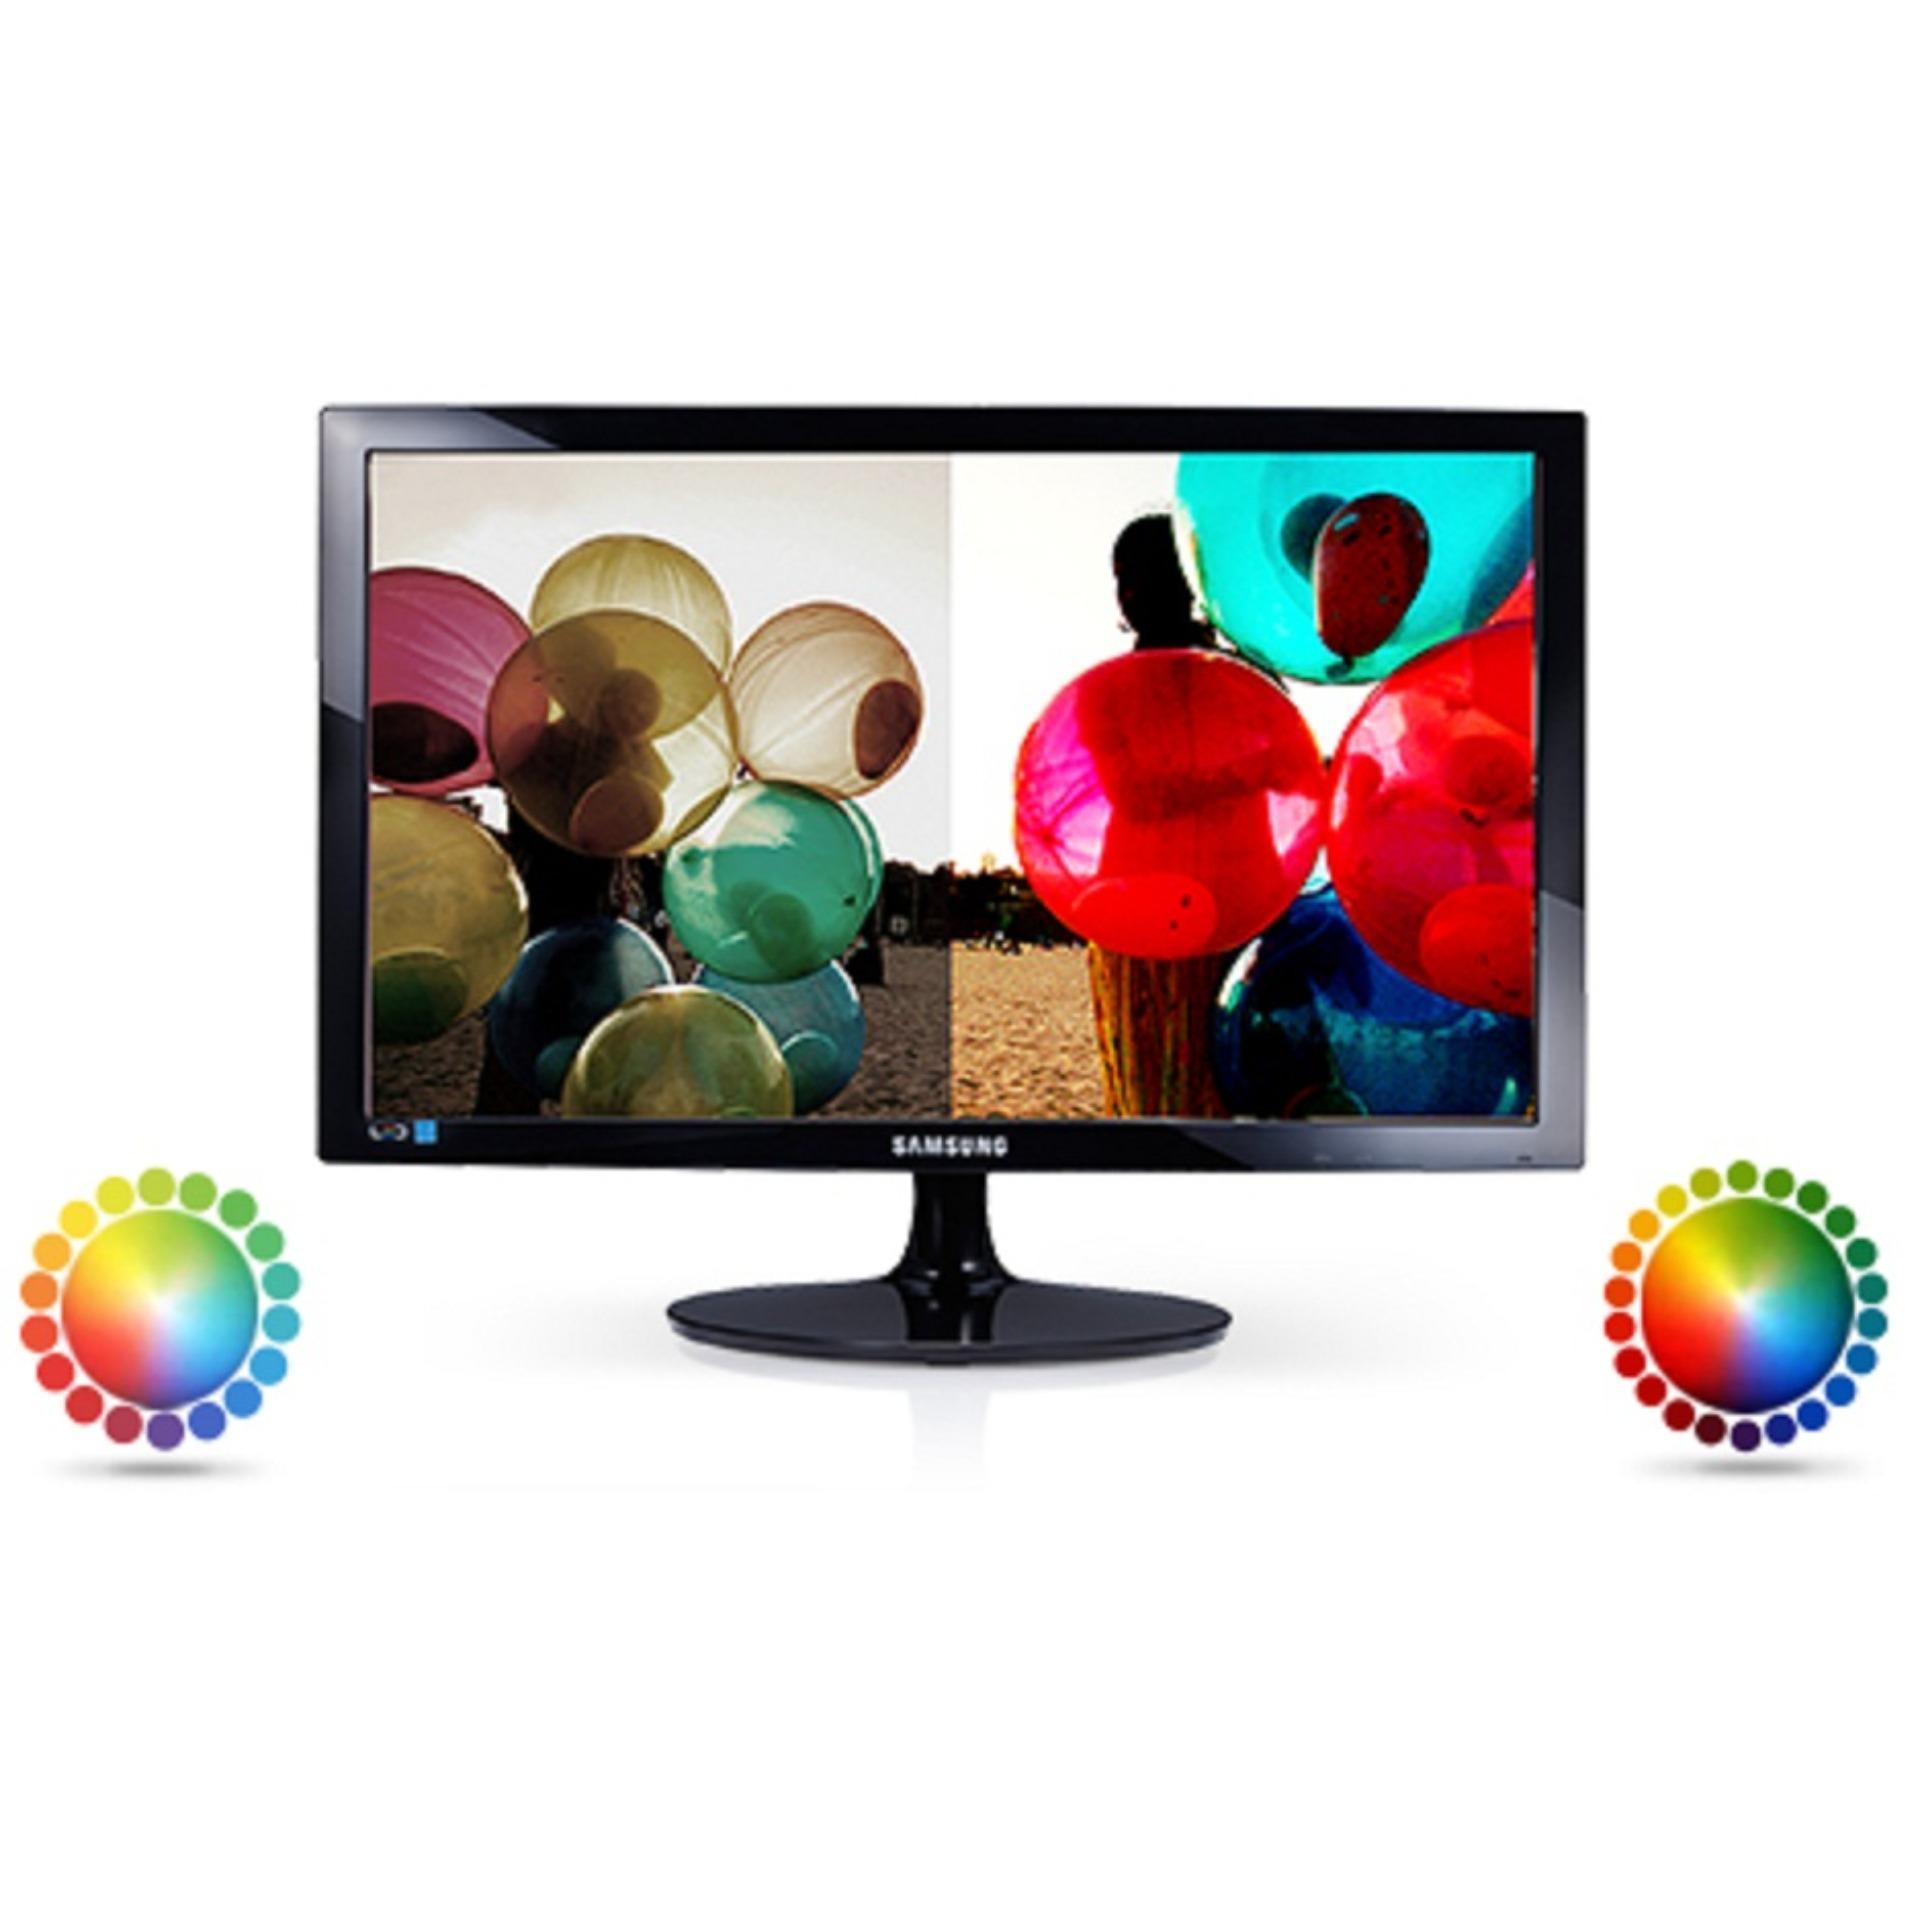 Samsung LED Monitor HDMI 19D300HY 18.5